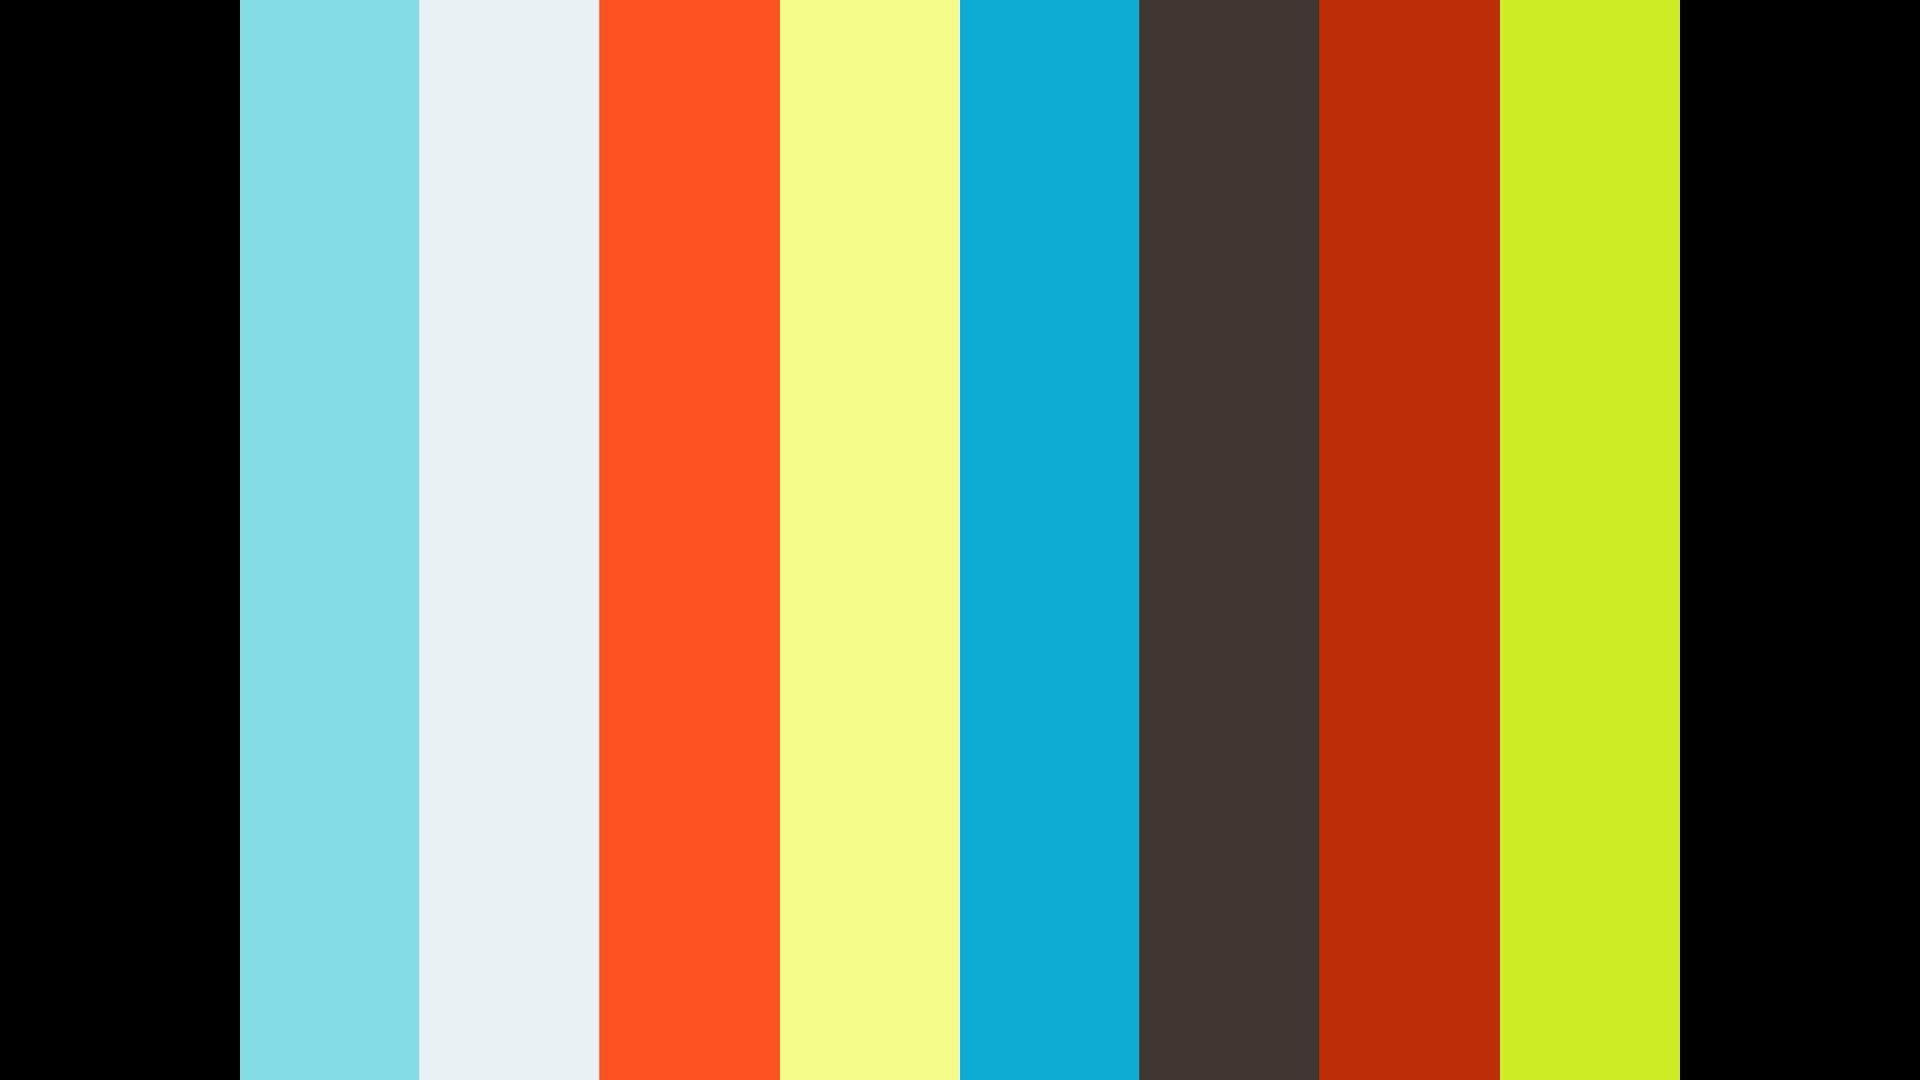 SCREENING OF SOMU MITRA CREATIONS BENGALI SHORT FILMS 'CHOR' & 'POCKET MAAR' & MUSIC VIDEO 'SUNDORI KAMALA' Directed & Produced